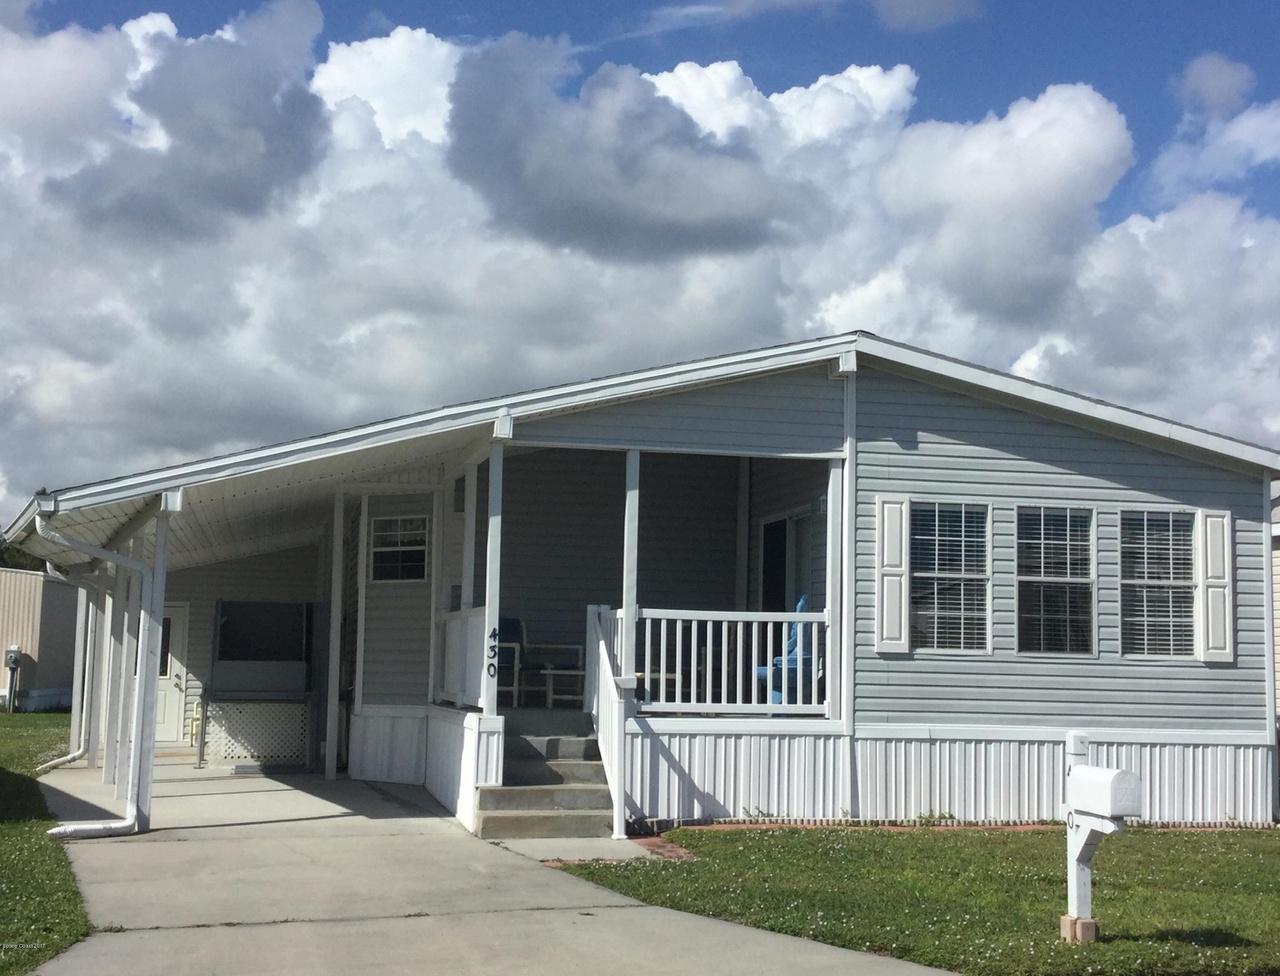 430 Holiday Park Blvd NE, Palm Bay, FL 32907 | MLS# 800123 | Redfin